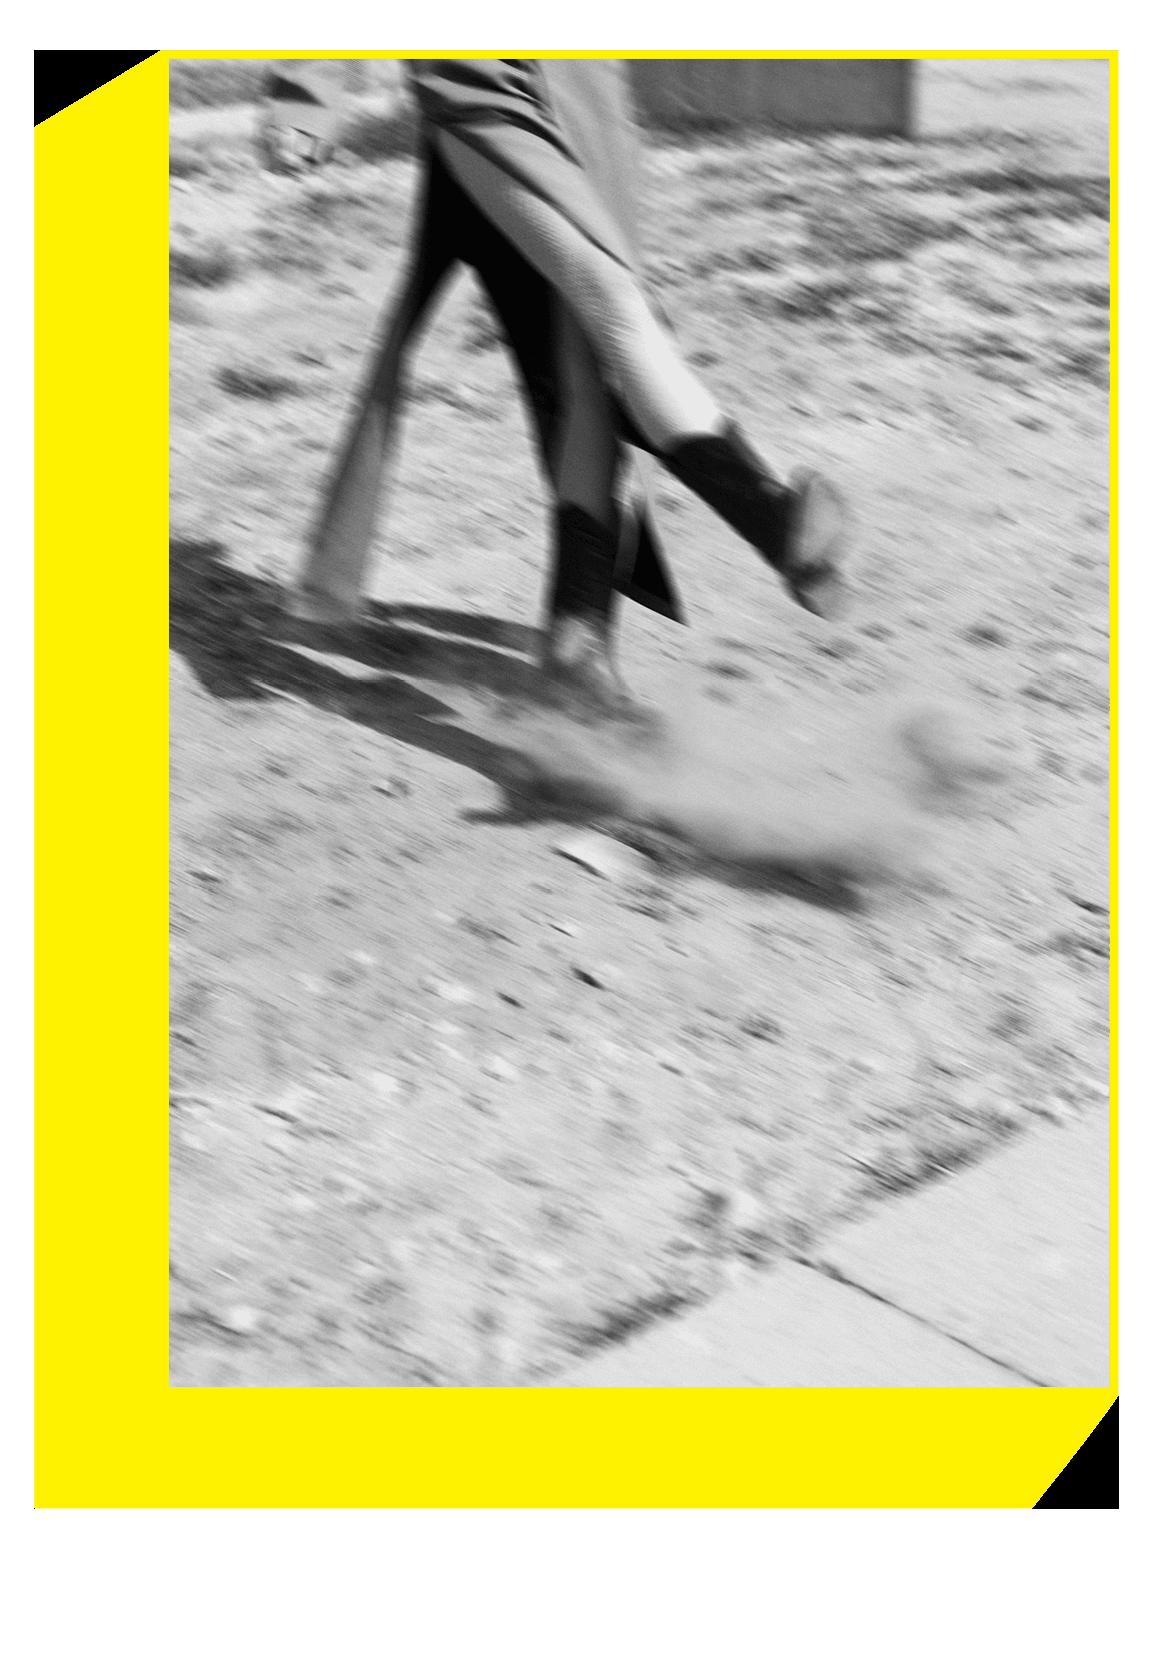 coat URTE KATILIUTE; shoes VINTAGE